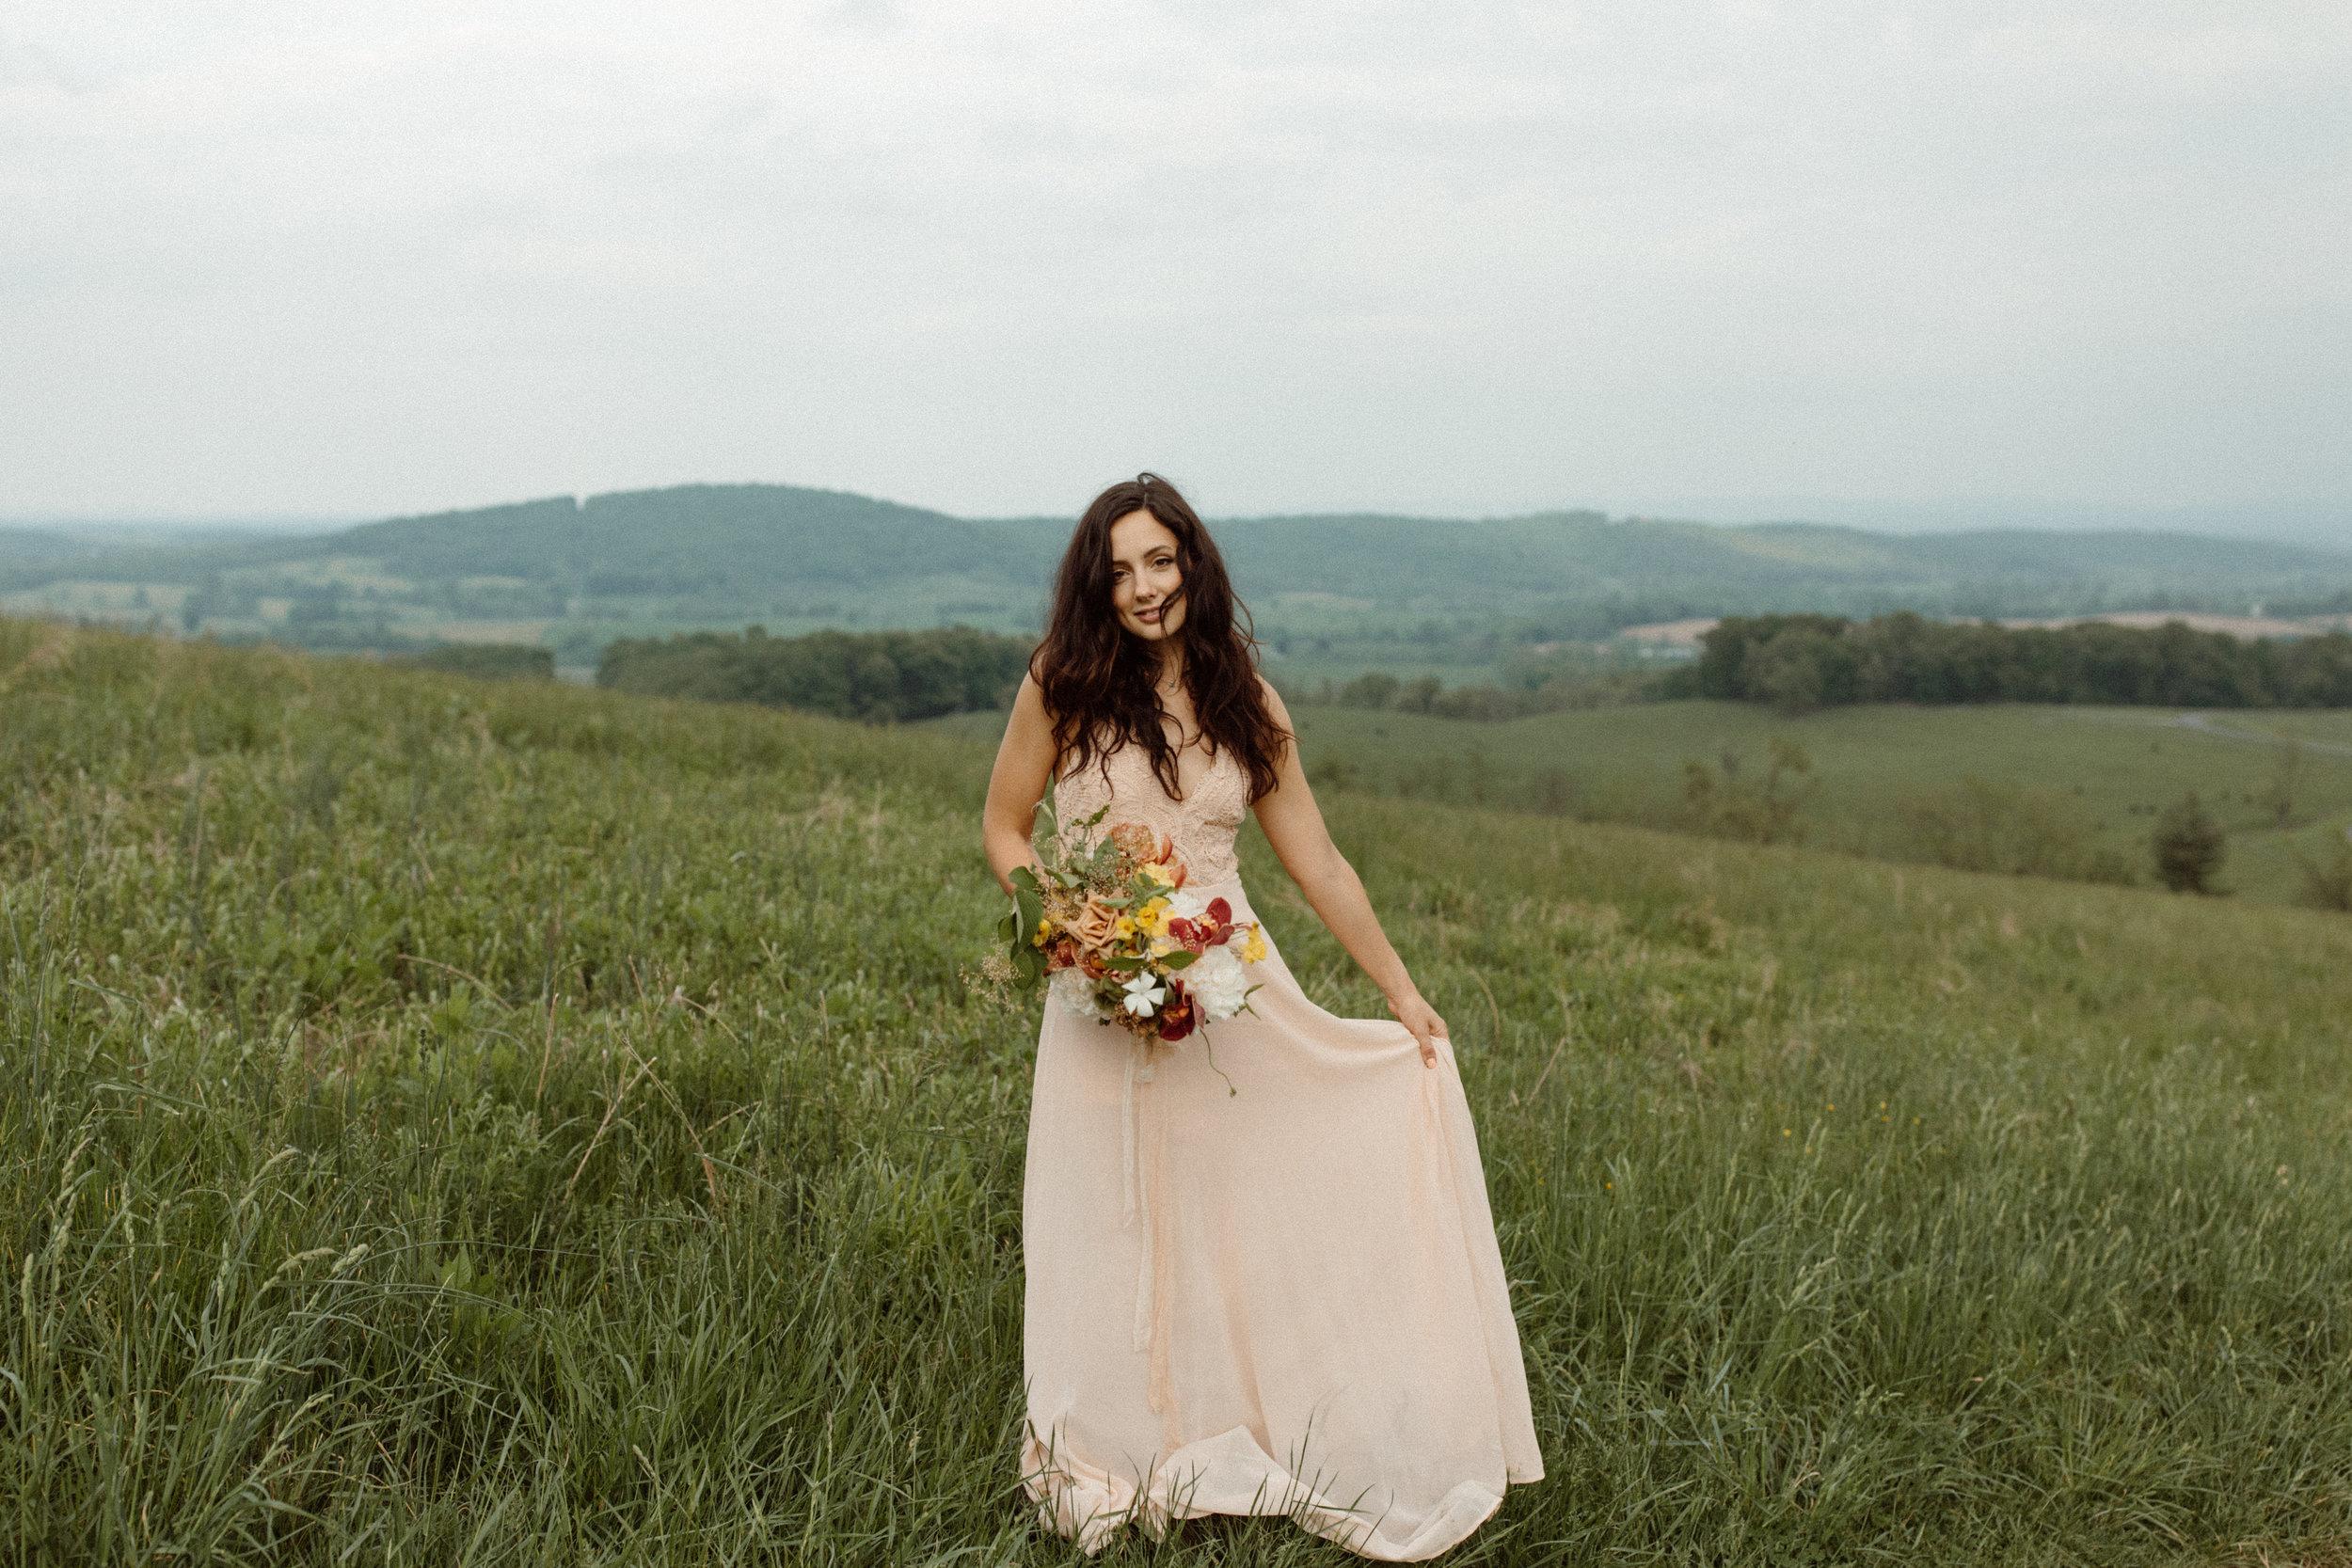 kelsey&mark-engagement-skymeadows-2019-peytoncurry-9438.jpg